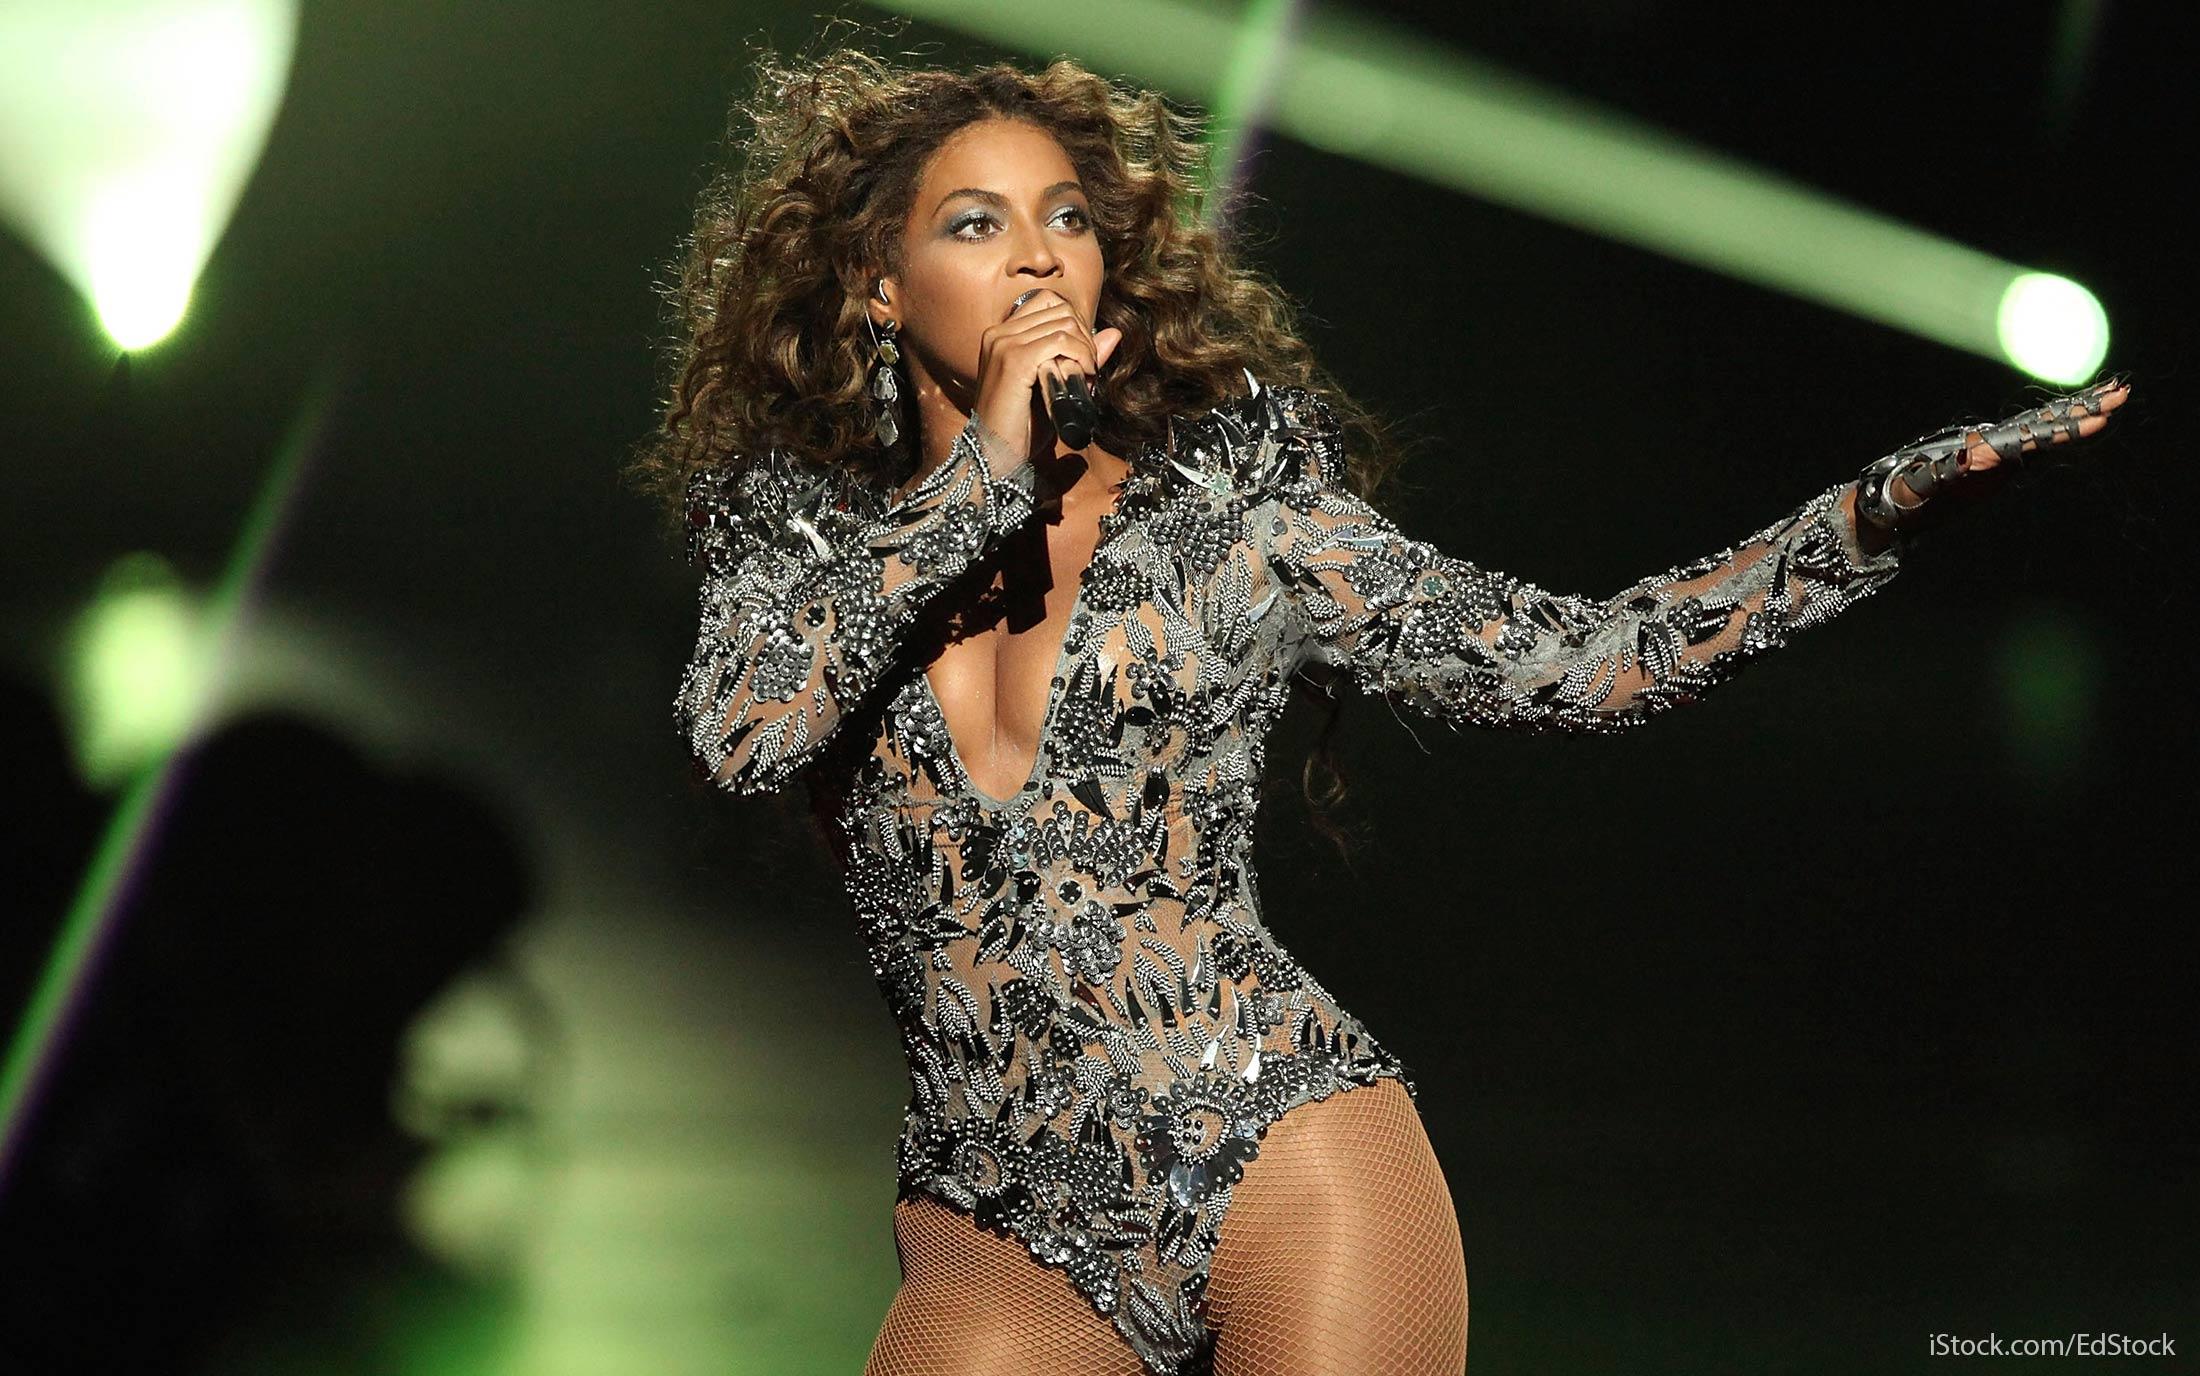 Beyonce 'Lemonade' premiere